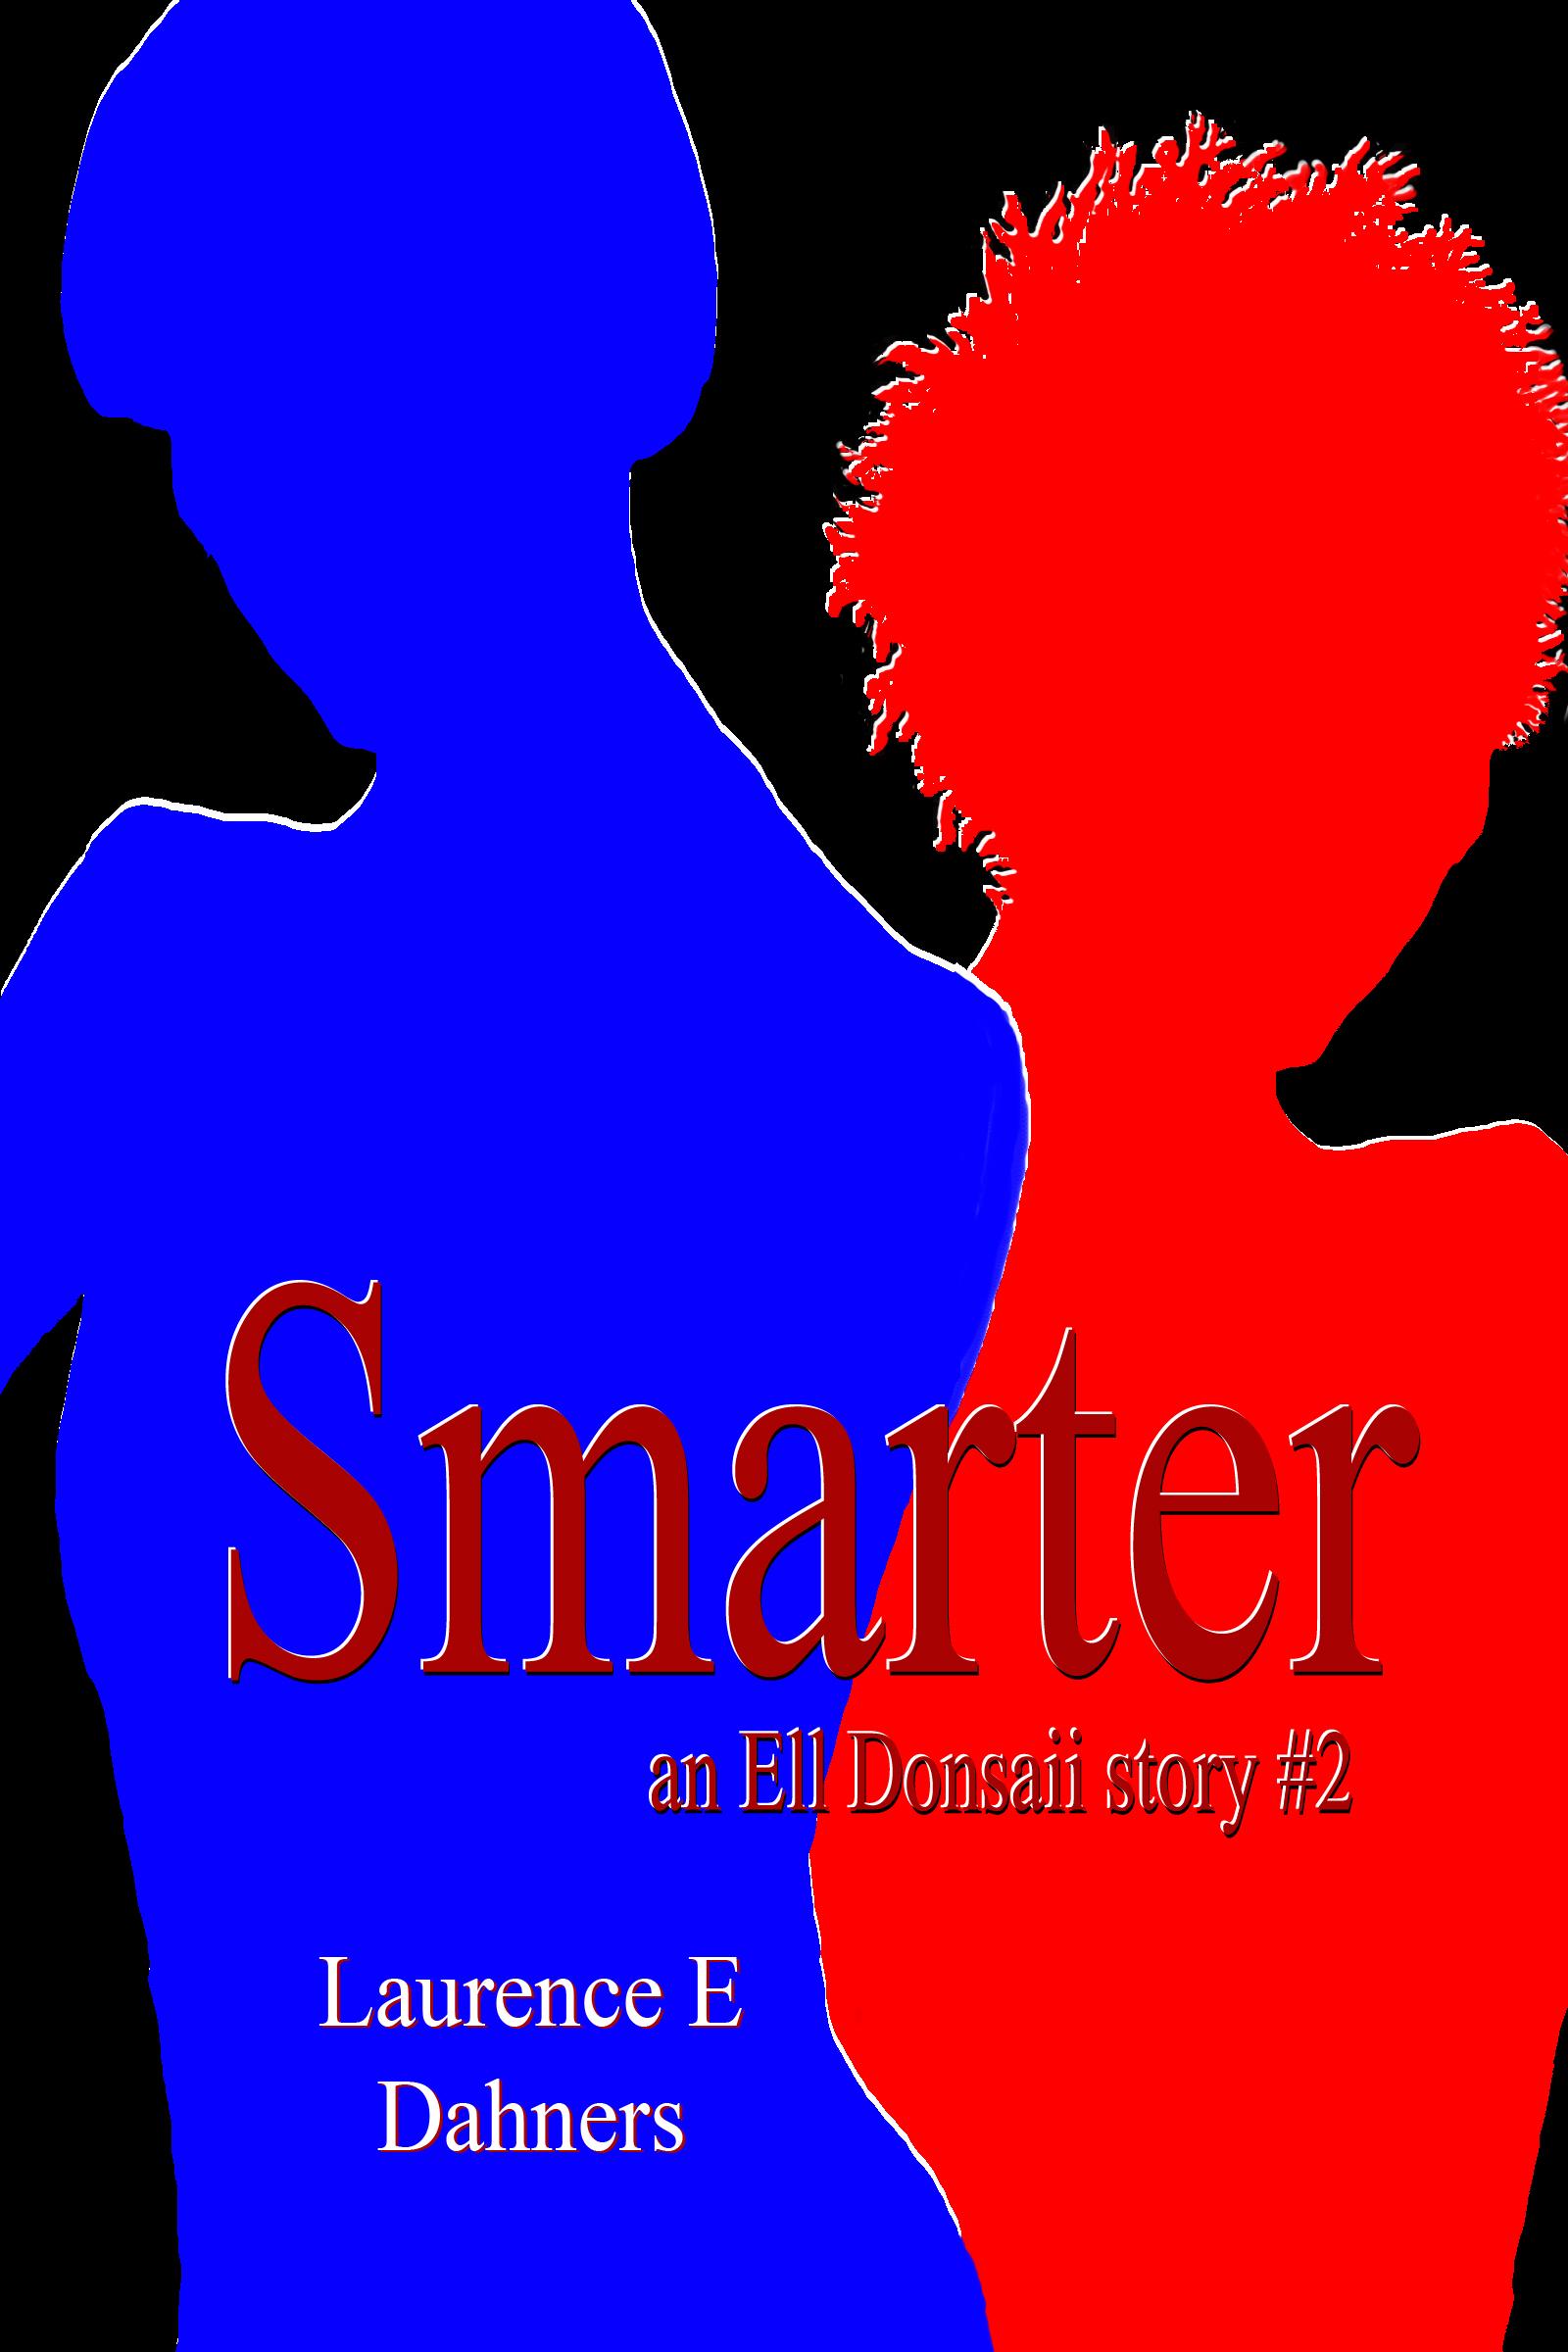 Laurence Dahners - Smarter (an Ell Donsaii story #2)